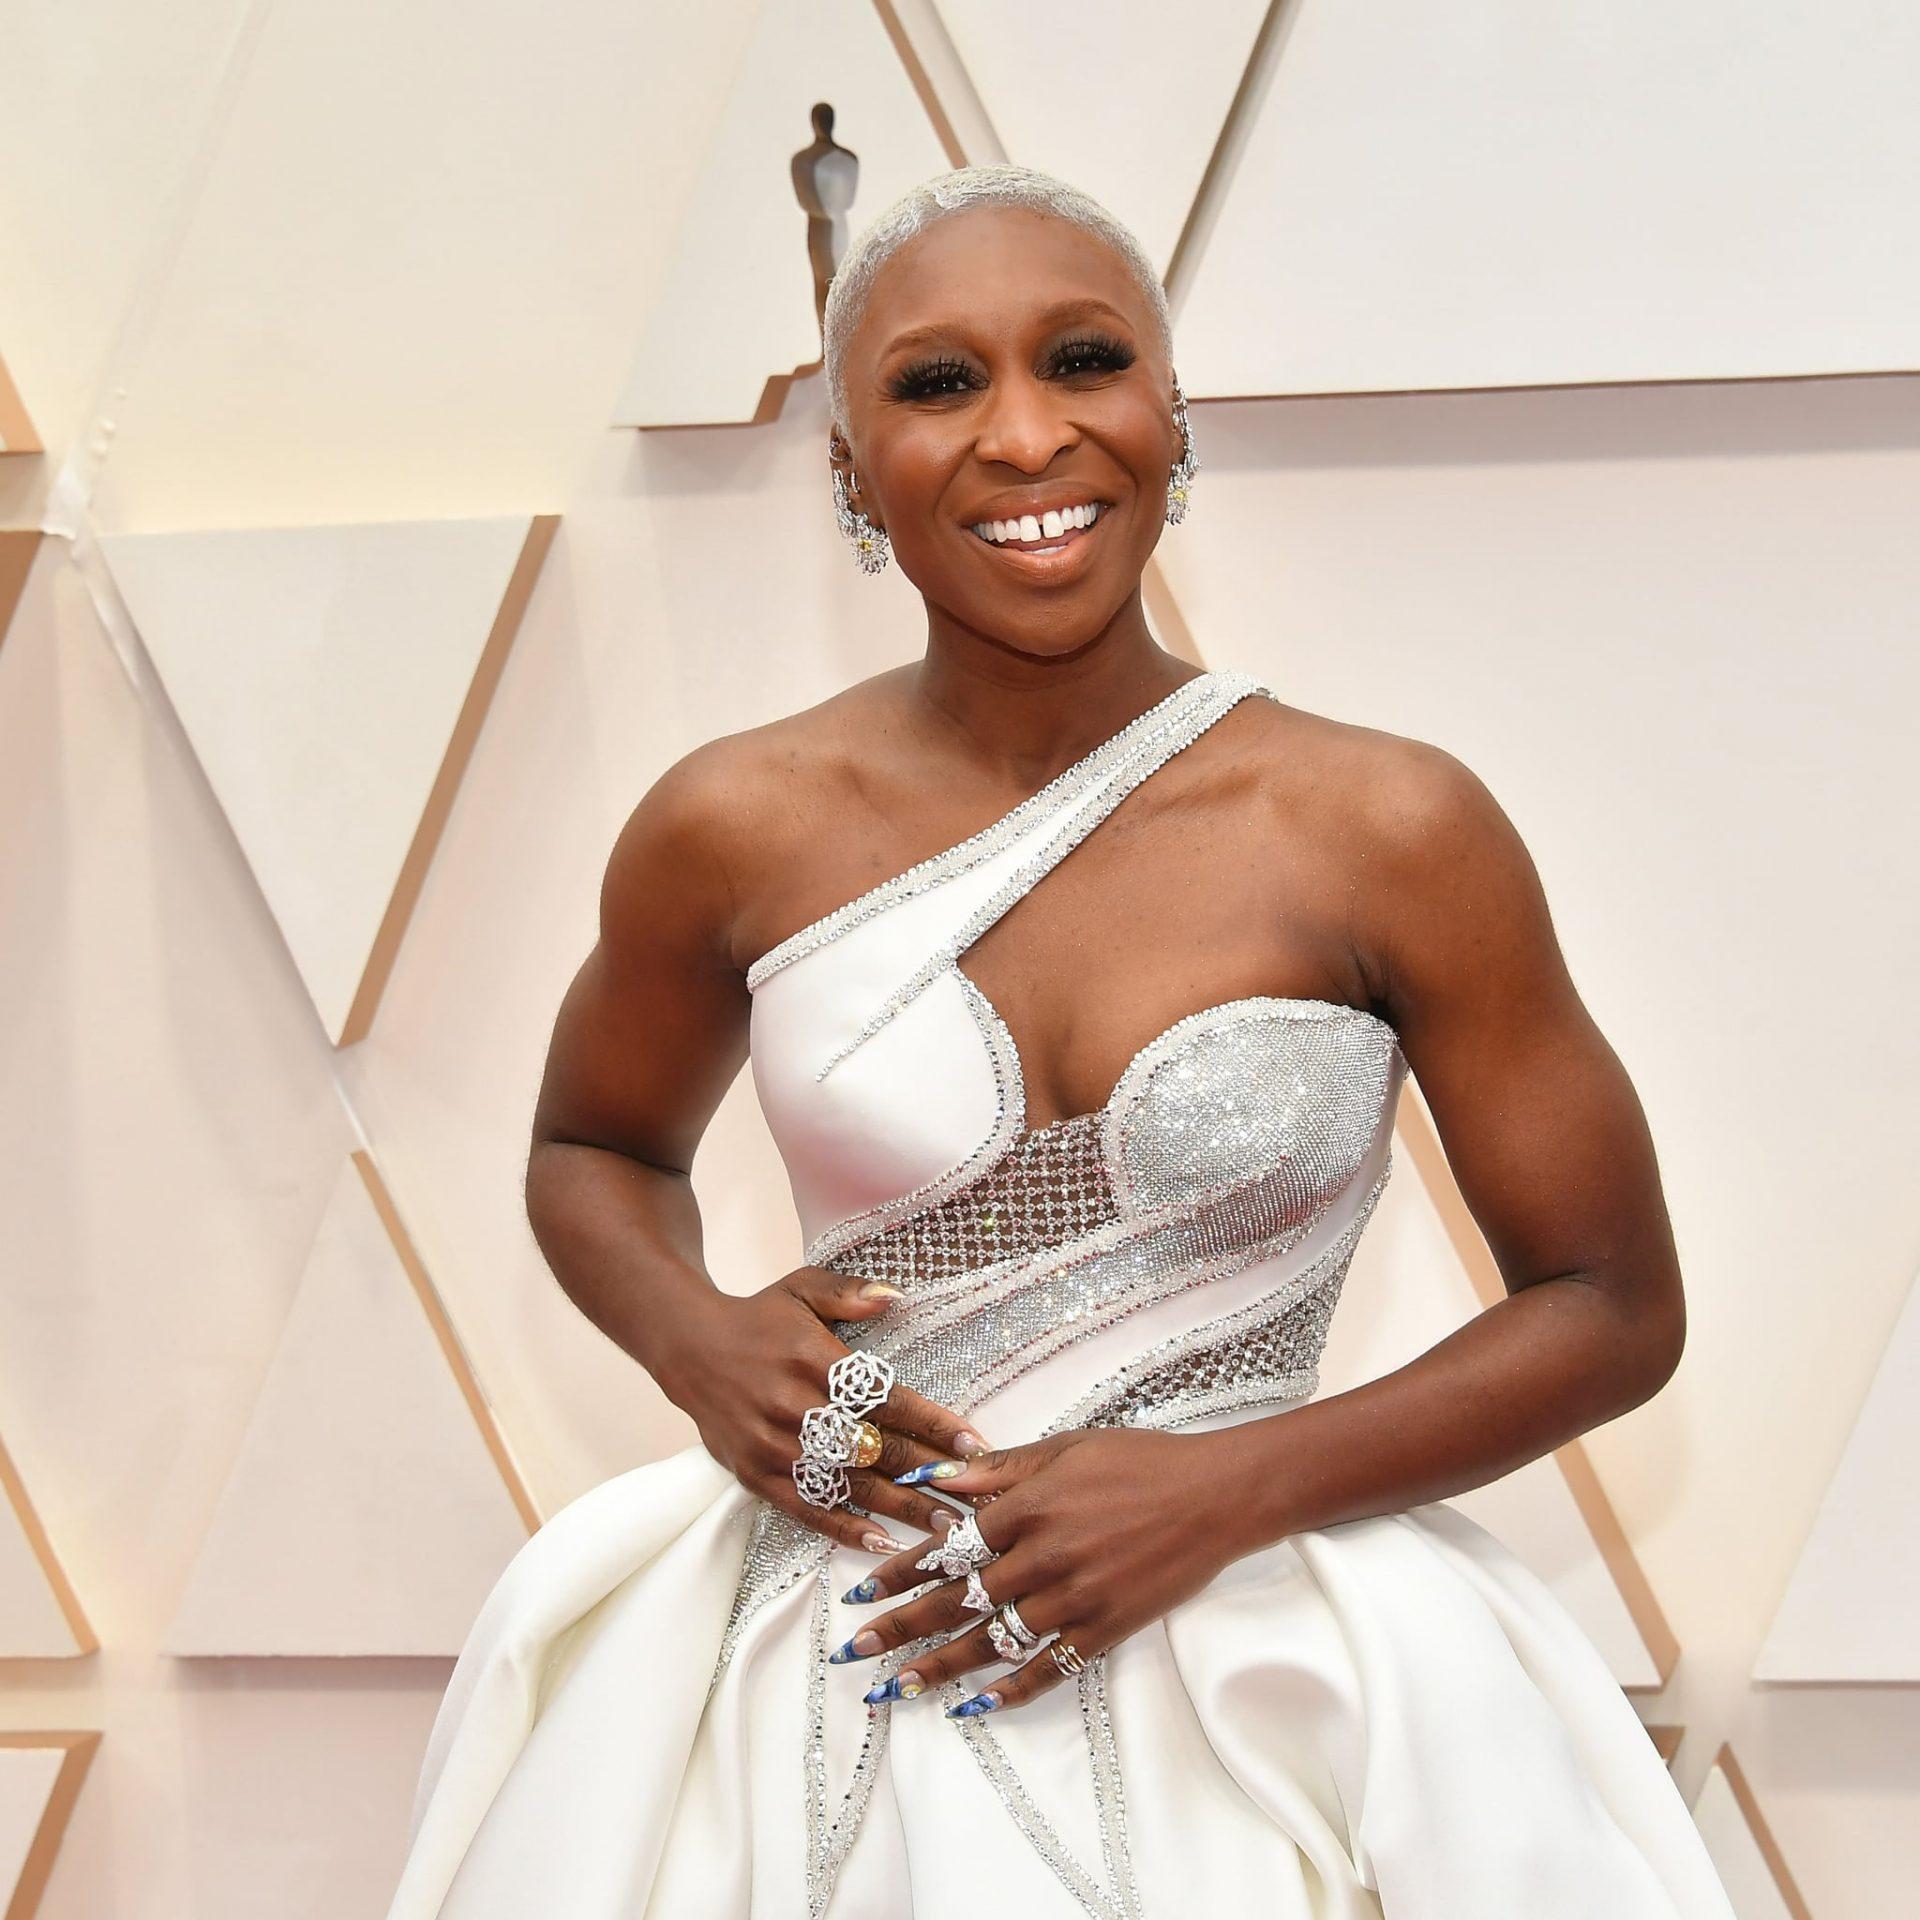 cynthia erivo nail art oscars 2020 – Top Oscar  Jewelry 2020: A Night of Glitz and Glamour